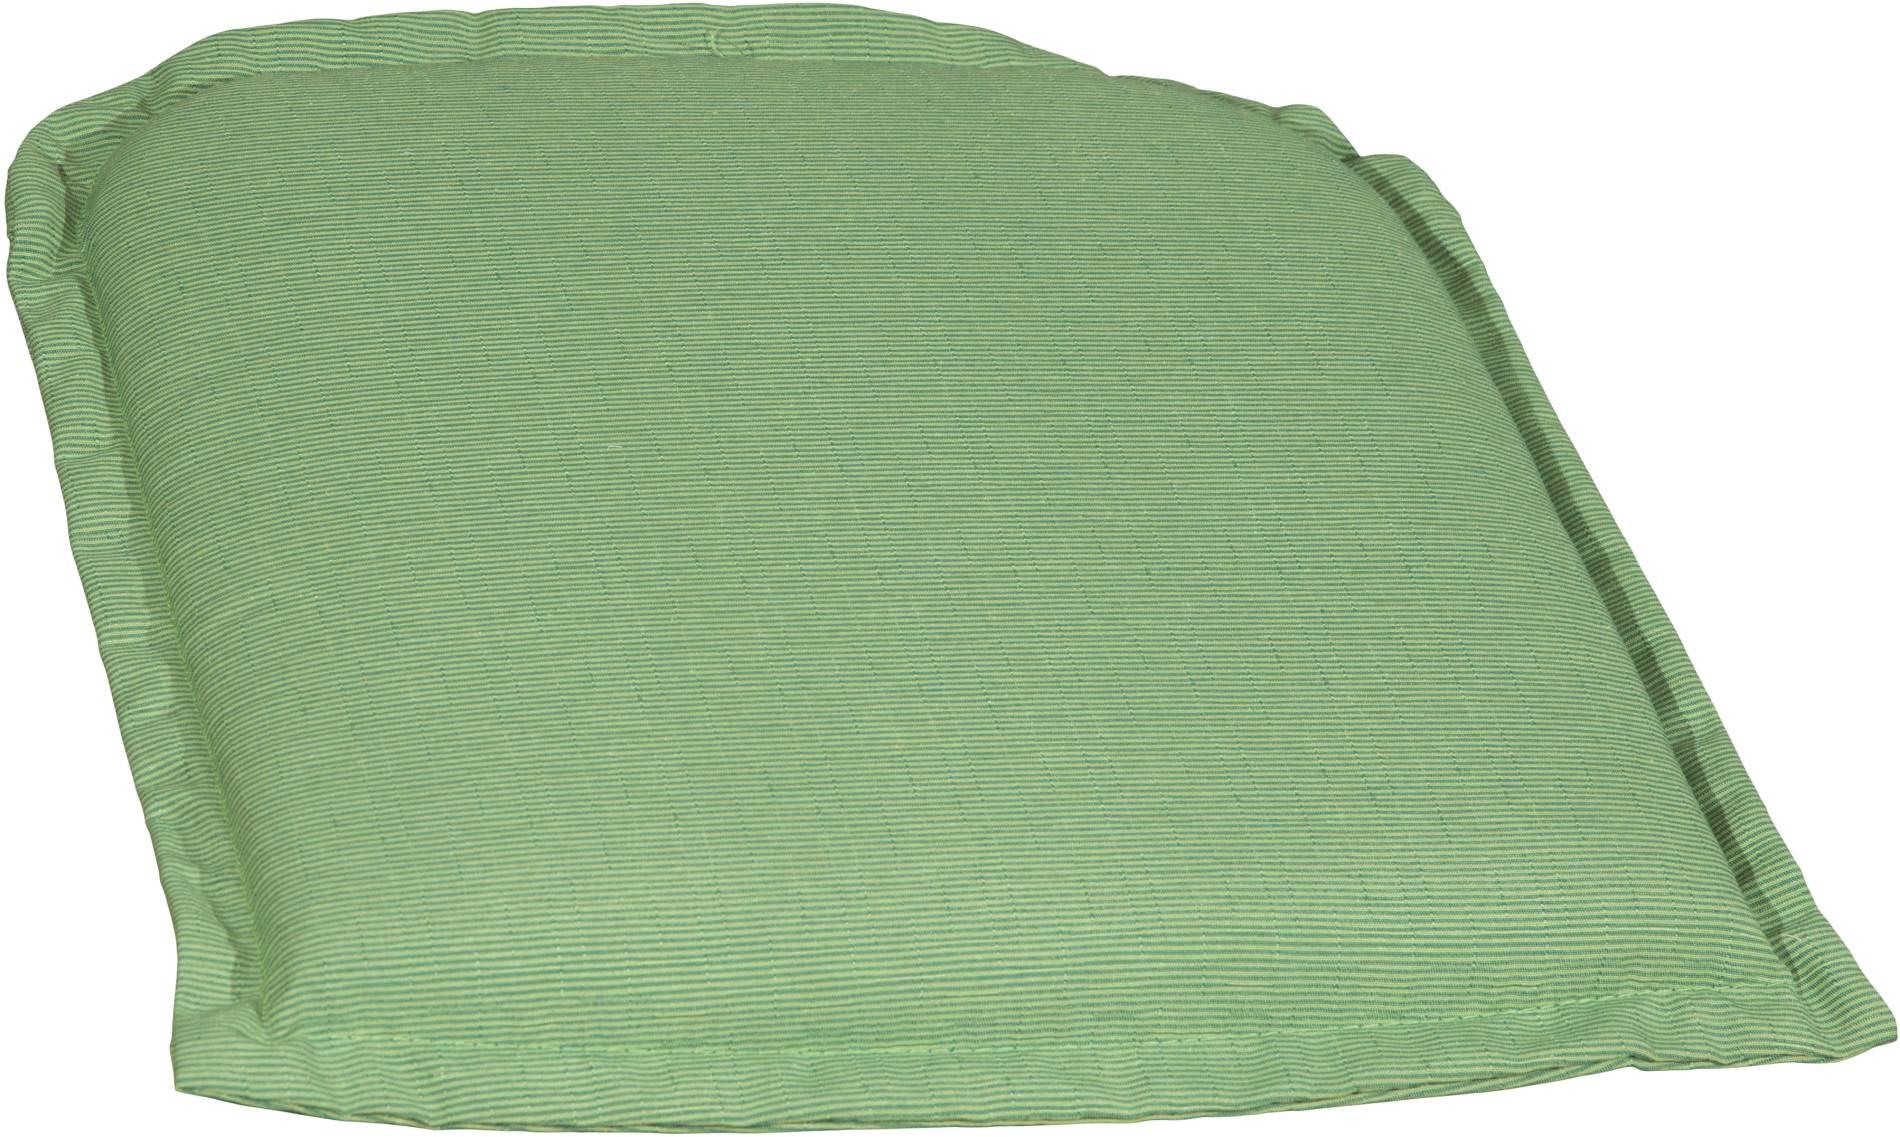 Acamp Kissen Model-R hellgrün für Salzburg, Hawaii, Carlos, Cesar, Savona, Wien, Auris und Rona ca. 45x45x5cm